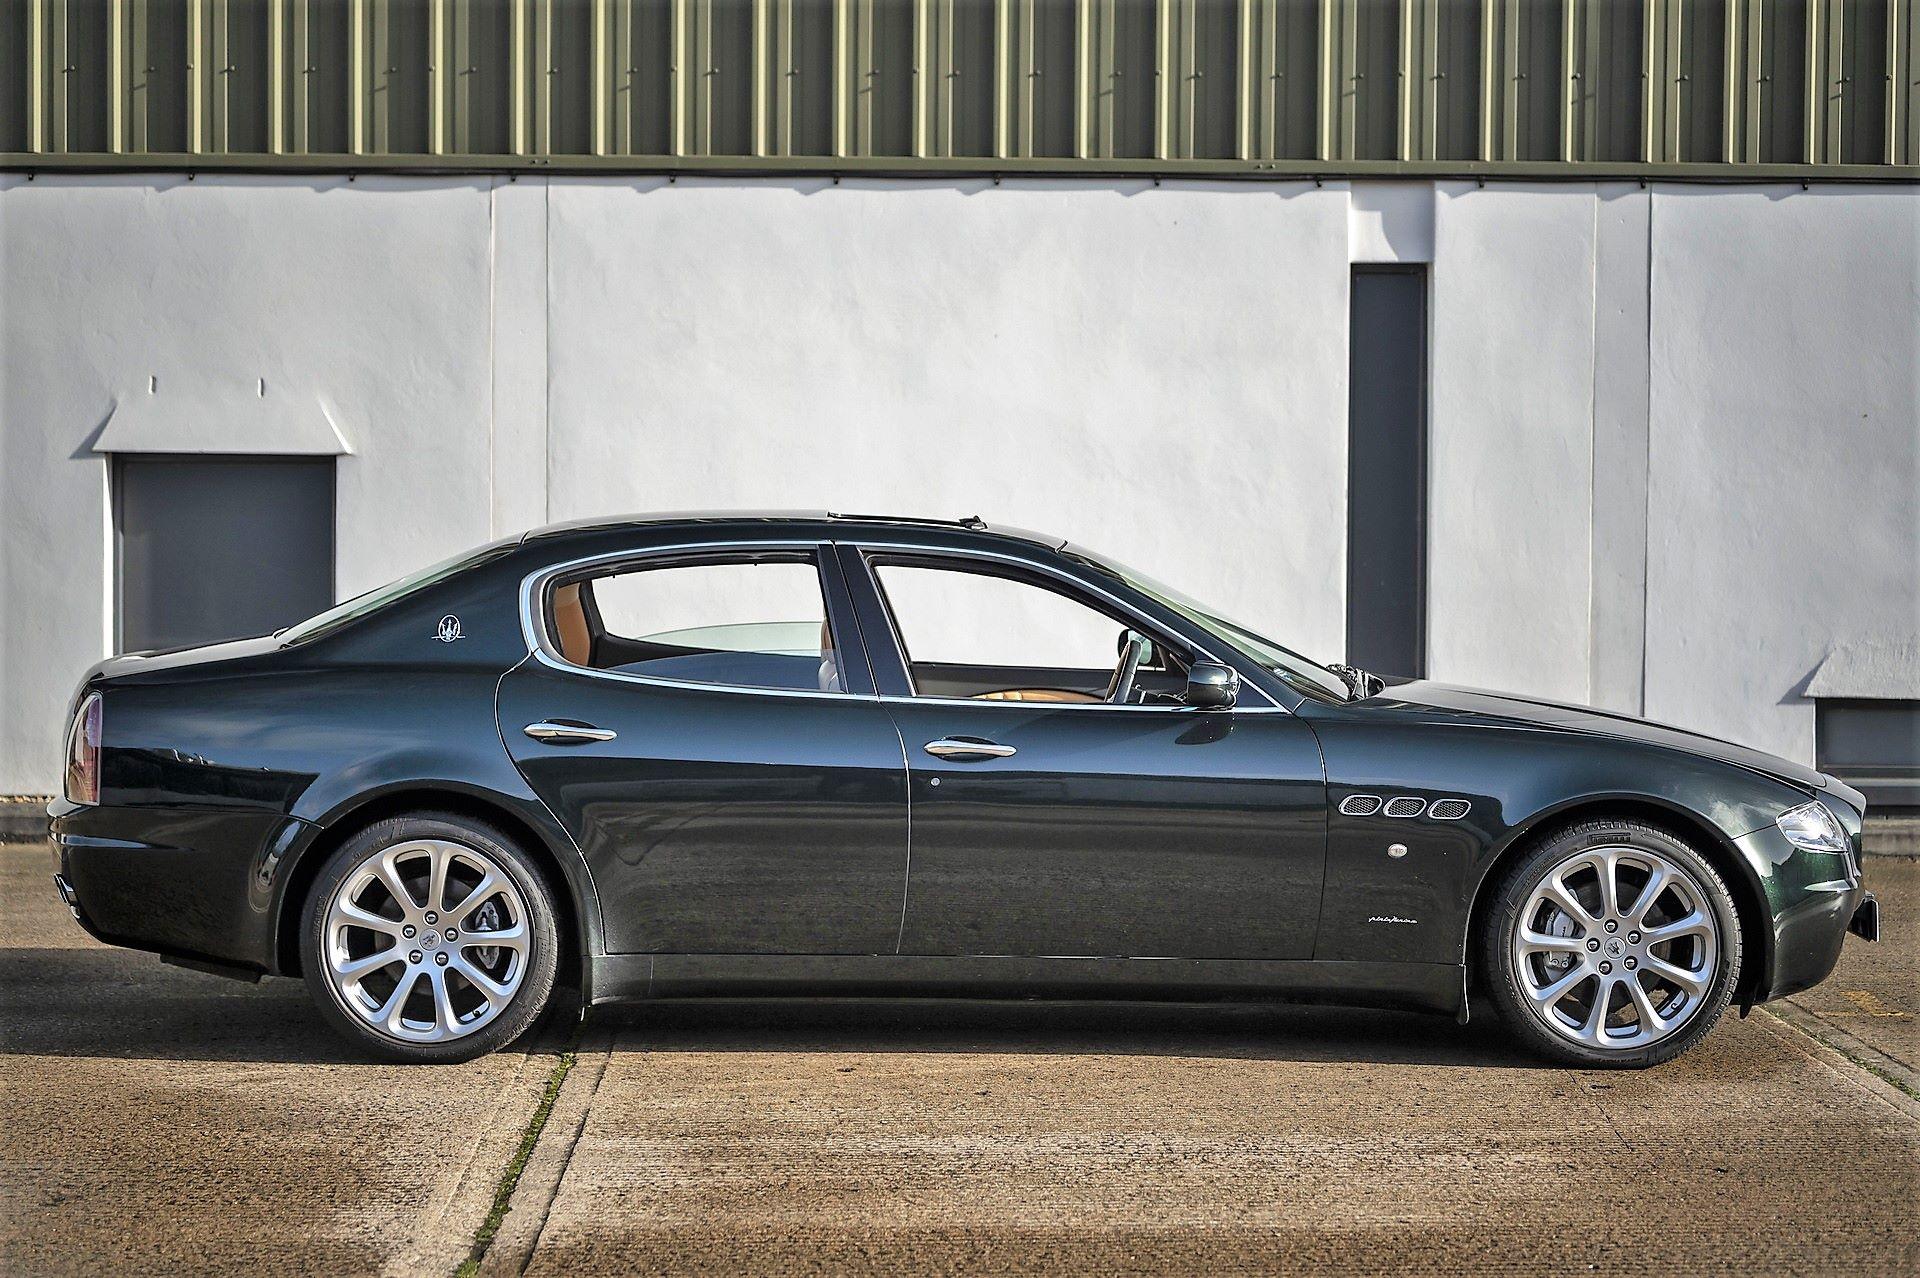 Elton-John-Maserati-Quattroporte-2